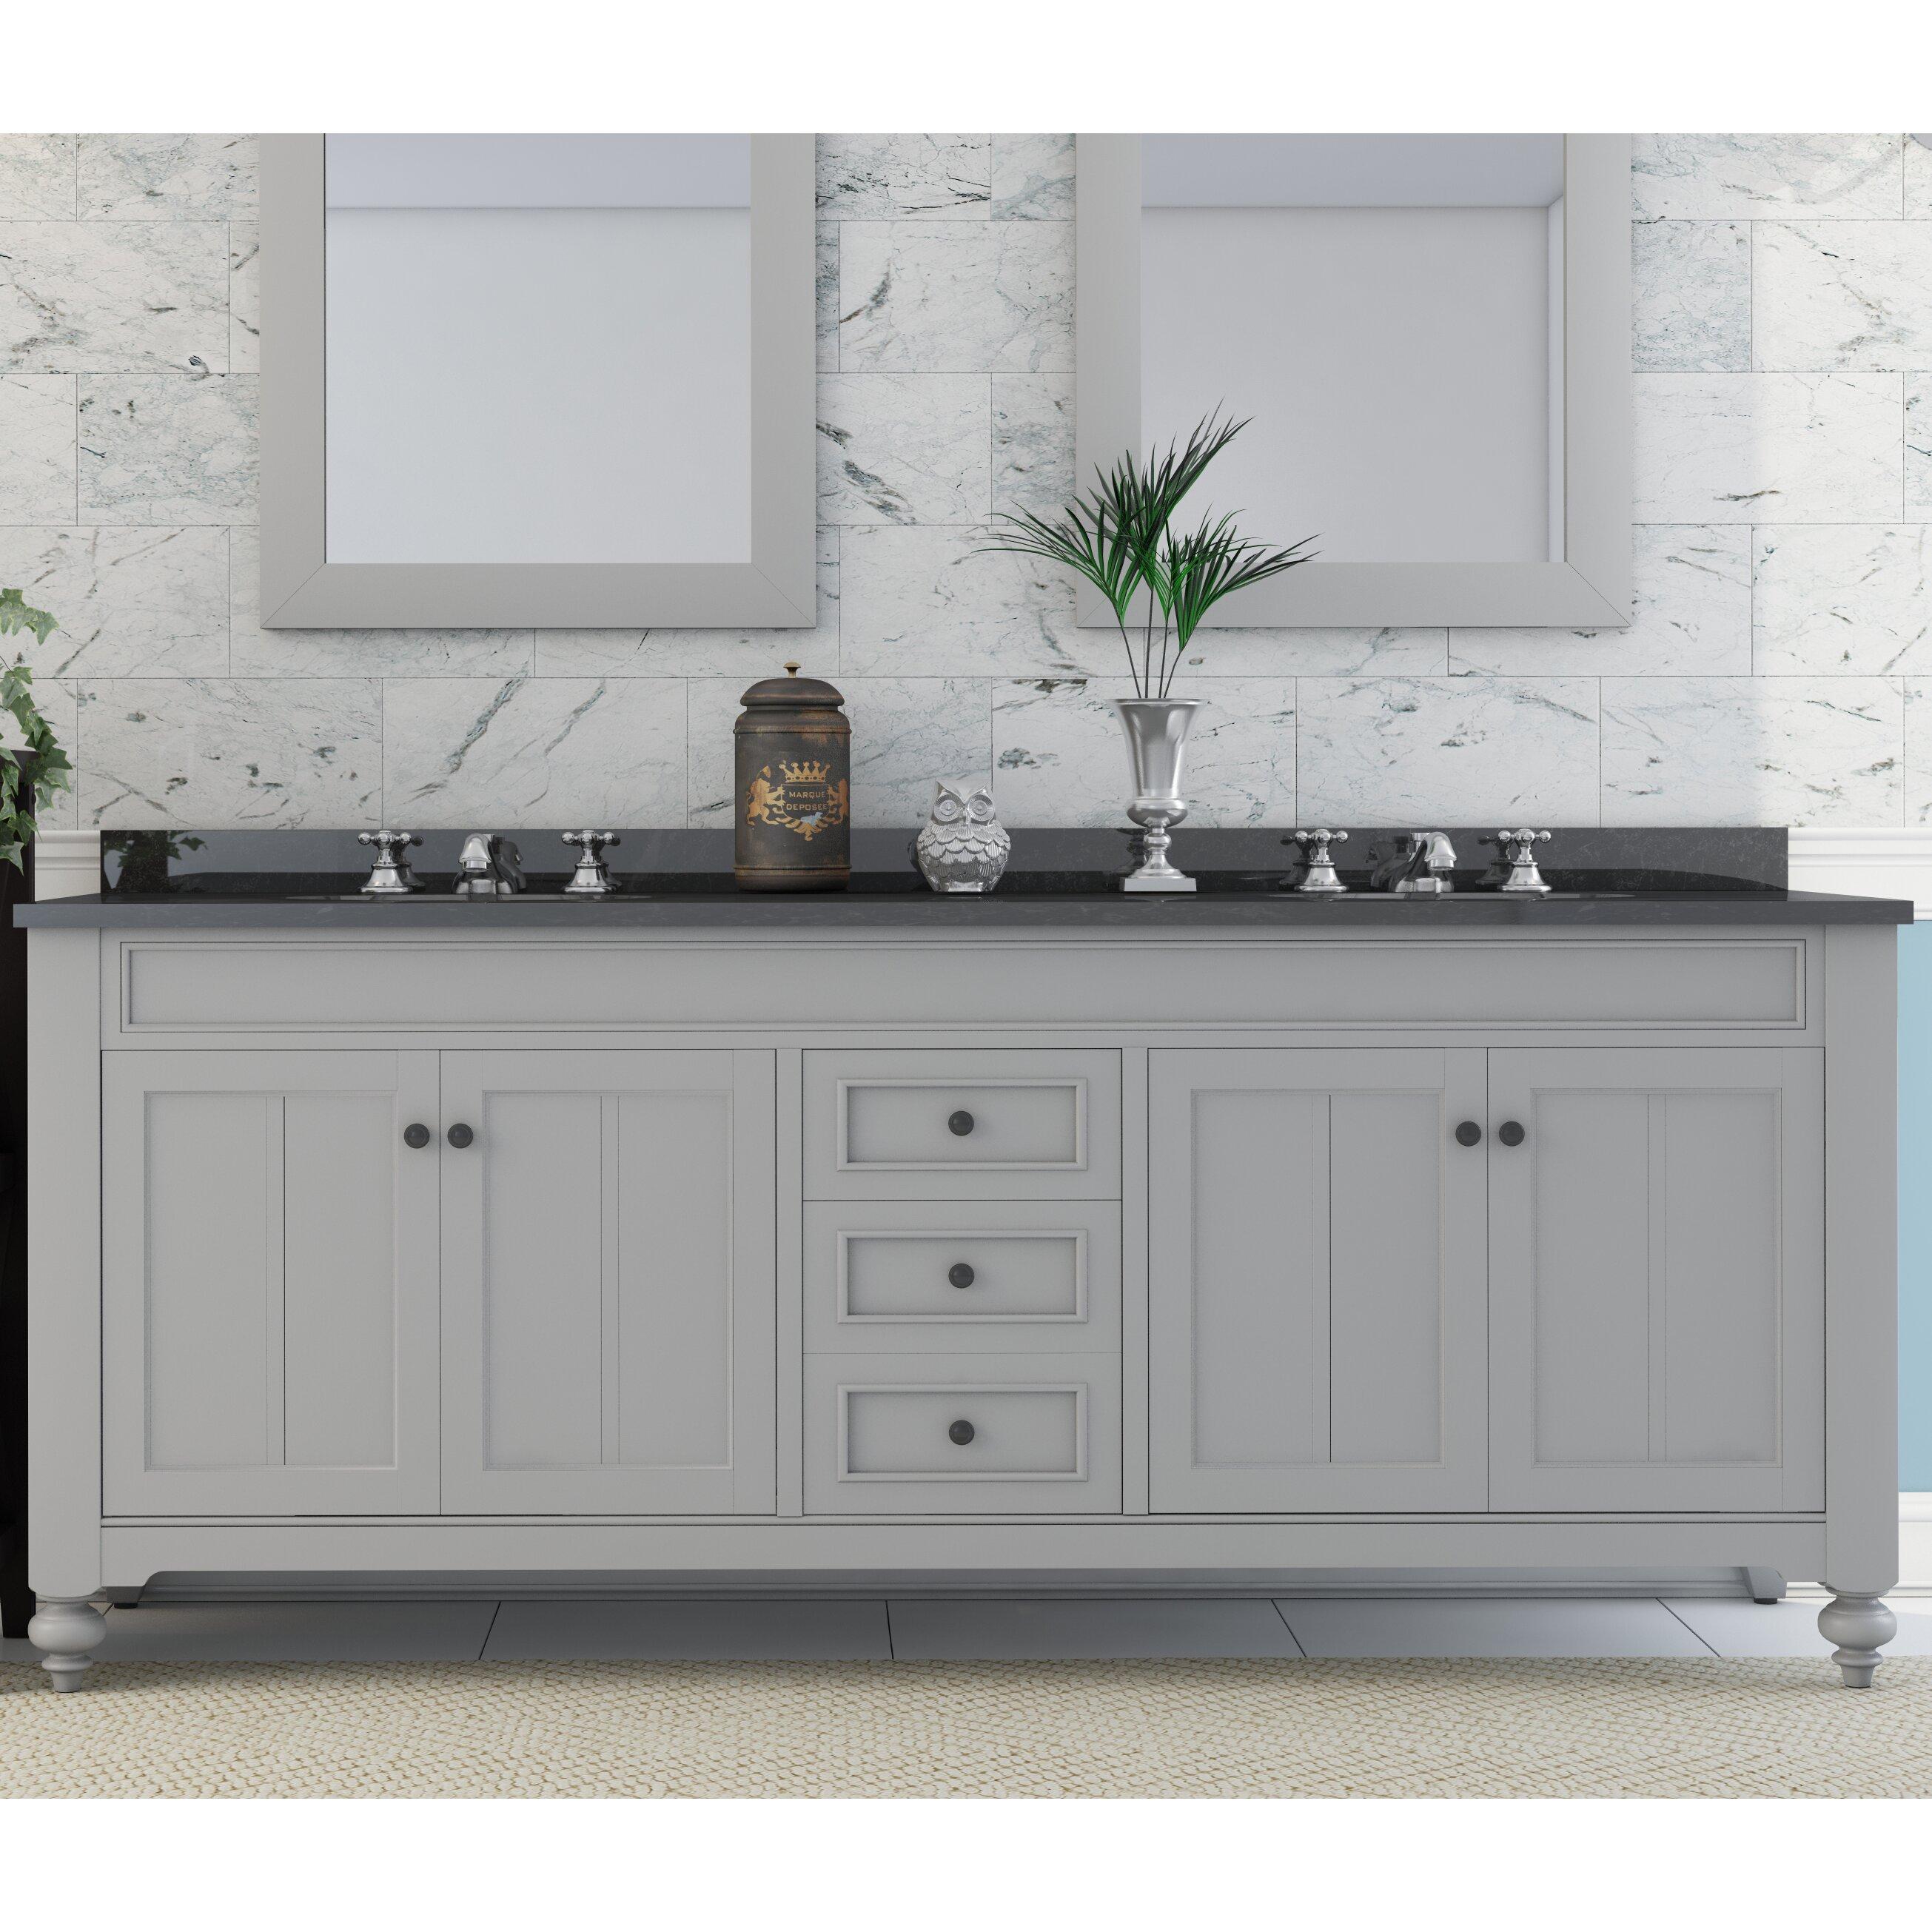 Three Posts Monique 72 quot  Double Sink Bathroom Vanity Set. Monique 72  Double Sink Bathroom Vanity Set   Reviews   Joss   Main